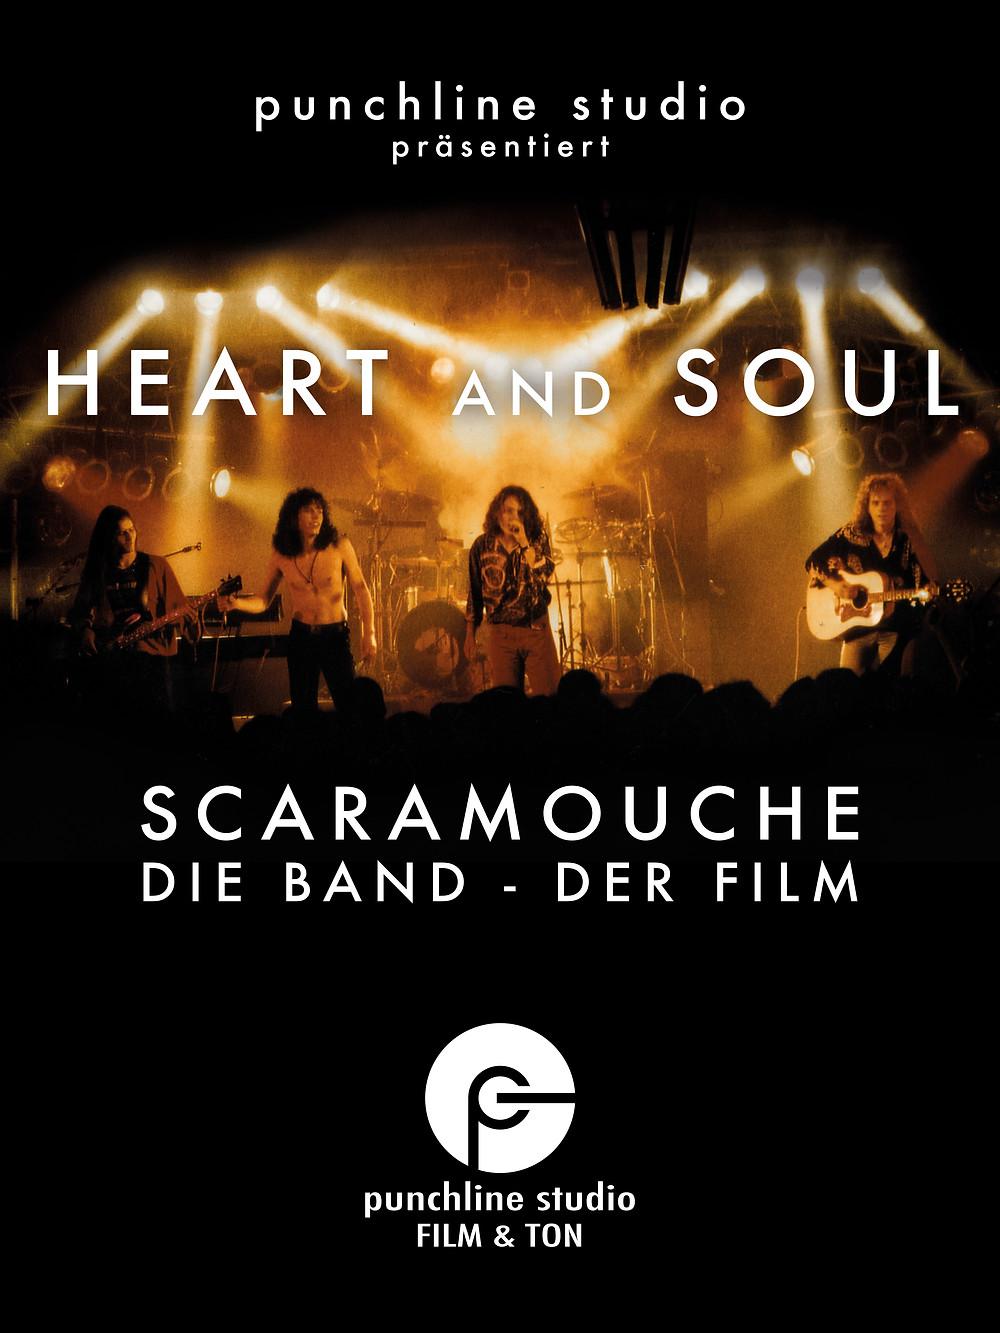 Scaramouche Lahr - Dokumentarfilm - Heart And Soul